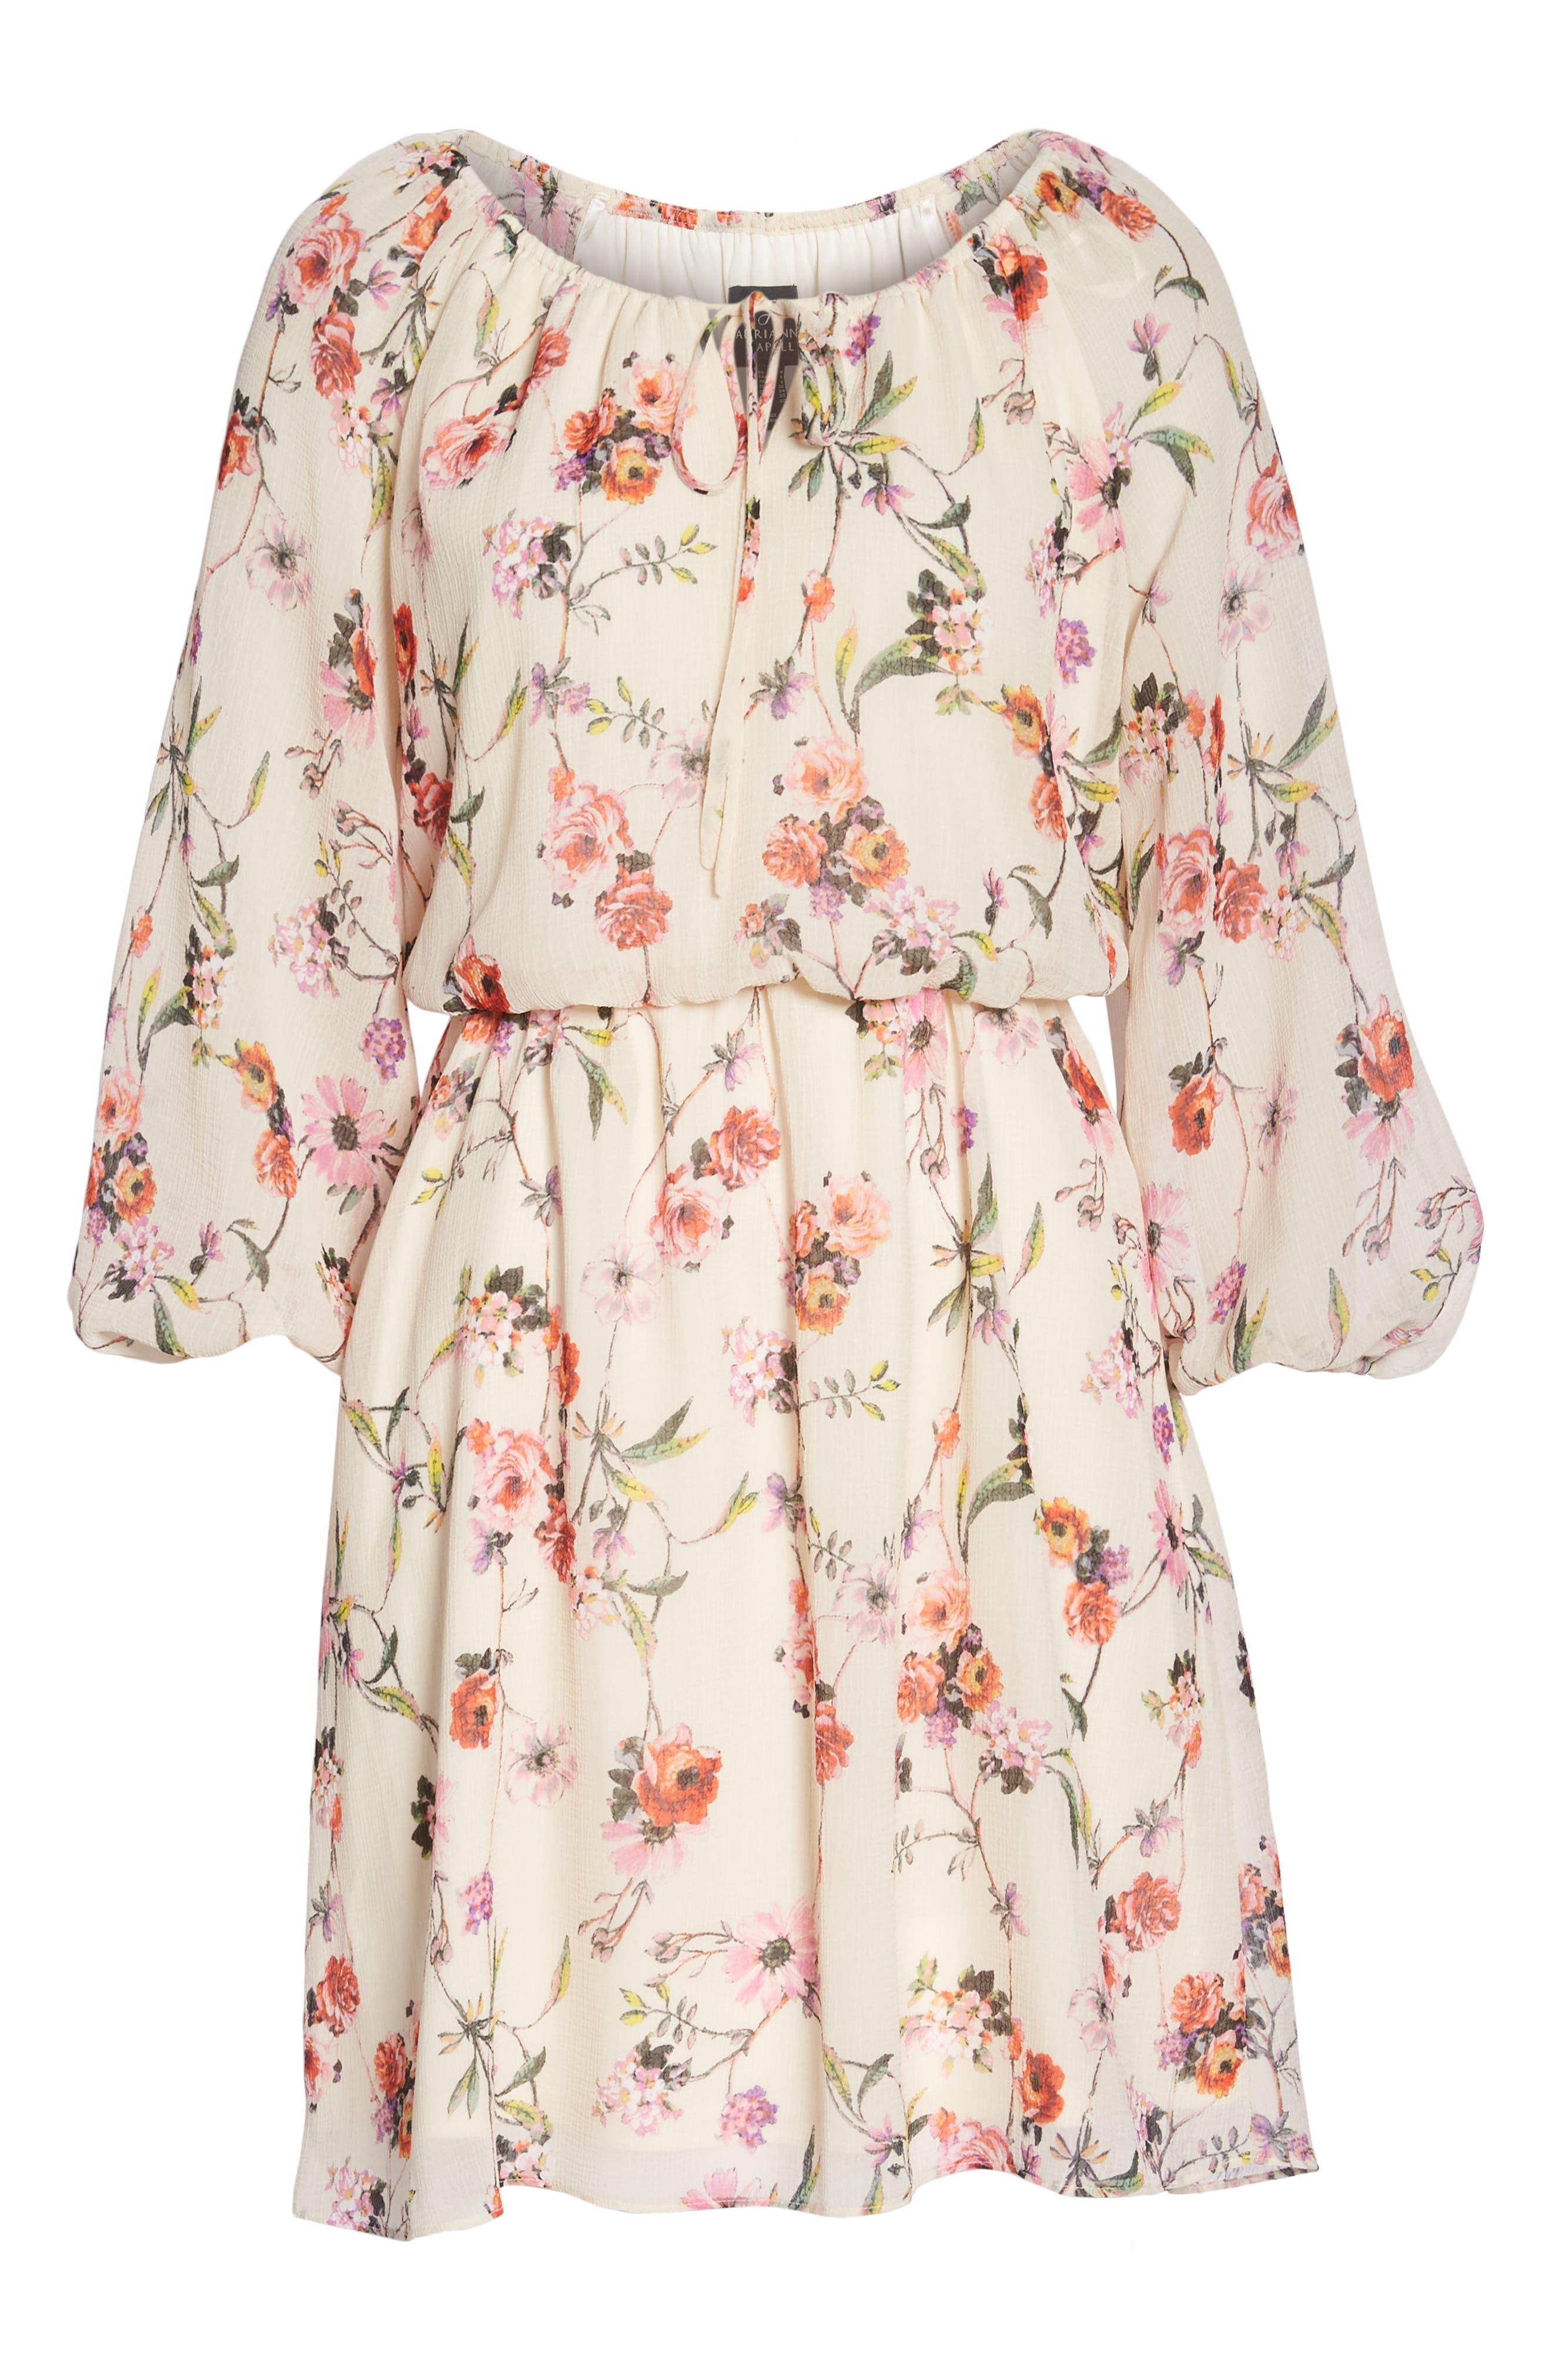 Bonita Oasis Floral Dress,                             Alternate thumbnail 7, color,                             IVORY MULTI